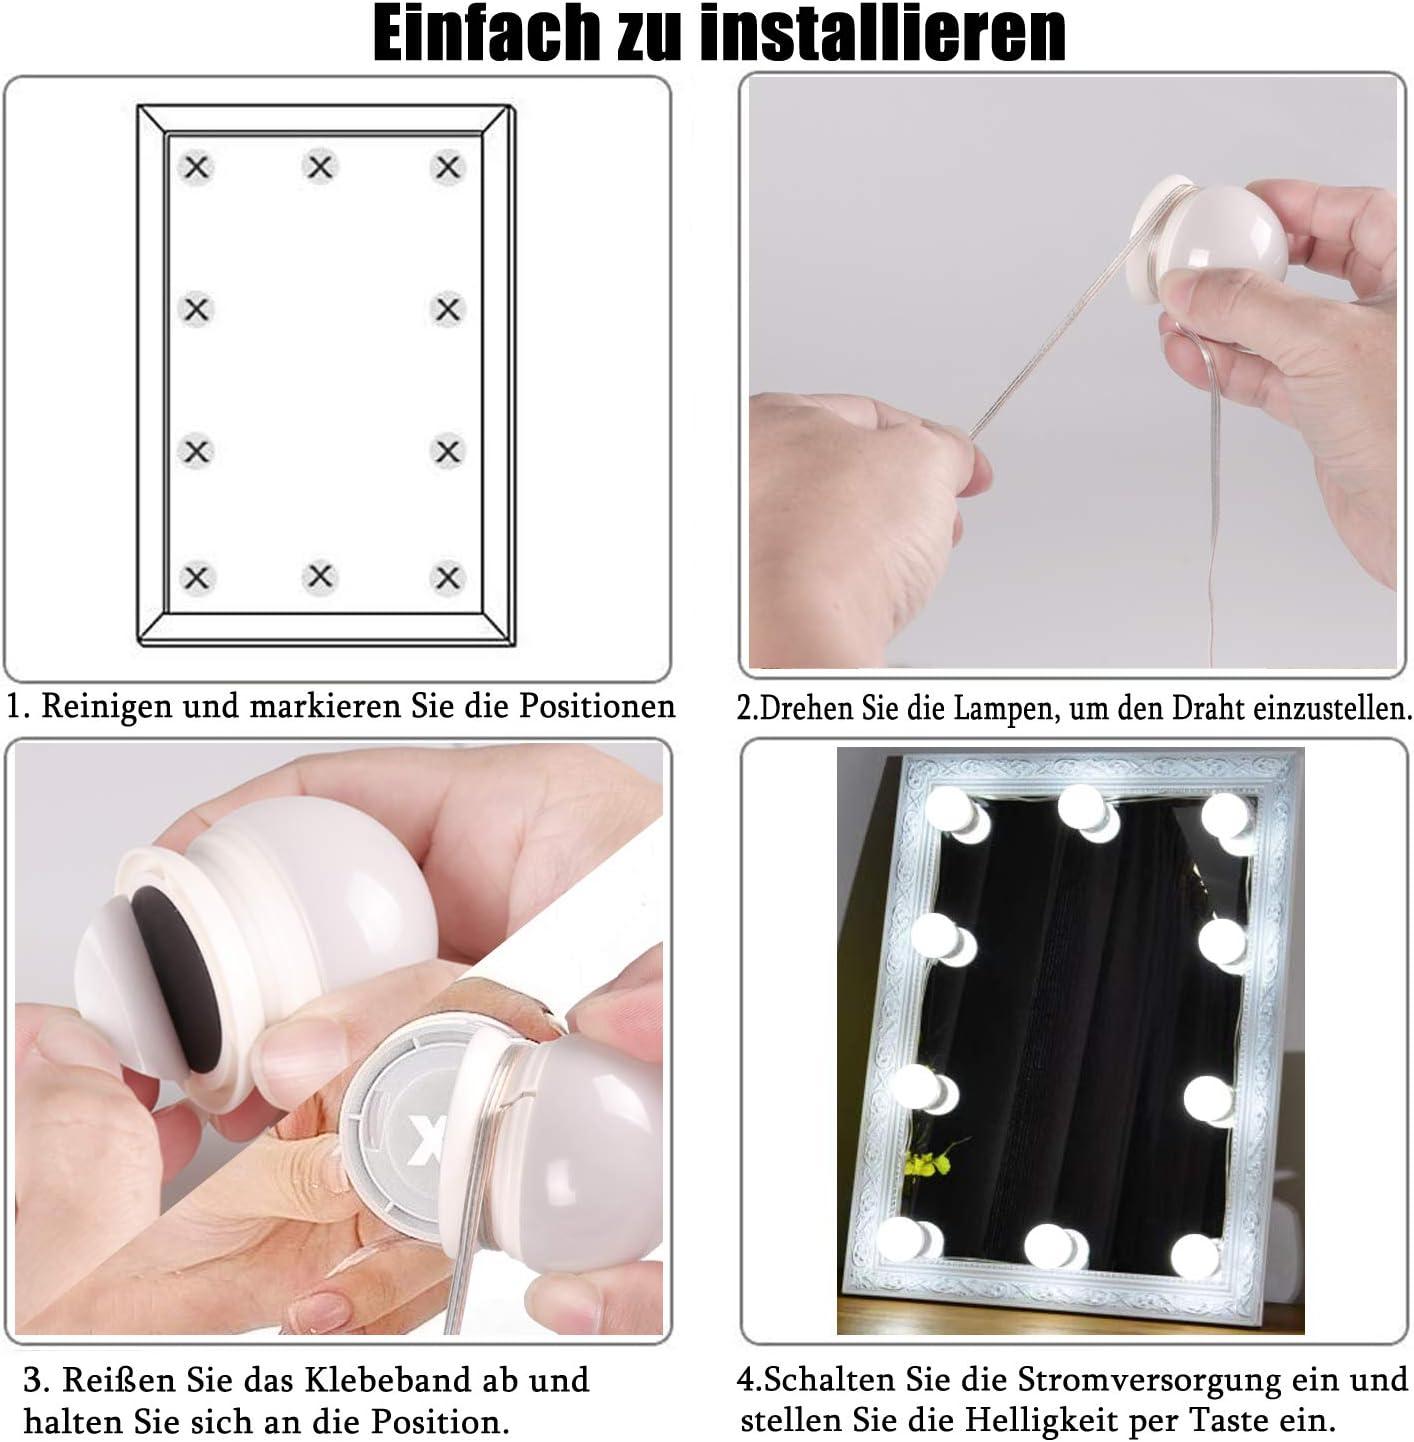 Luces de Espejo Maquillaje QYH 10 bombillas Hollywood Kit de luz LED regulable L/ámpara de espejo cosm/ética para ba/ño 5 colores 5 niveles de brillo con cable USB